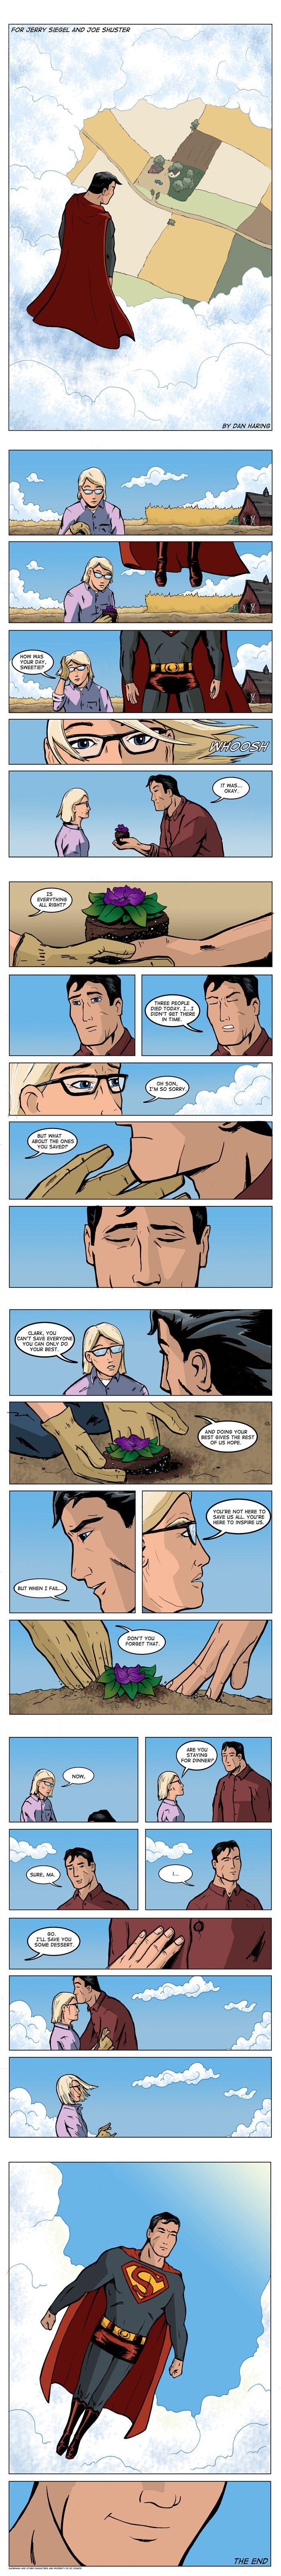 Superman Comic http://geekxgirls.com/article.php?ID=6817